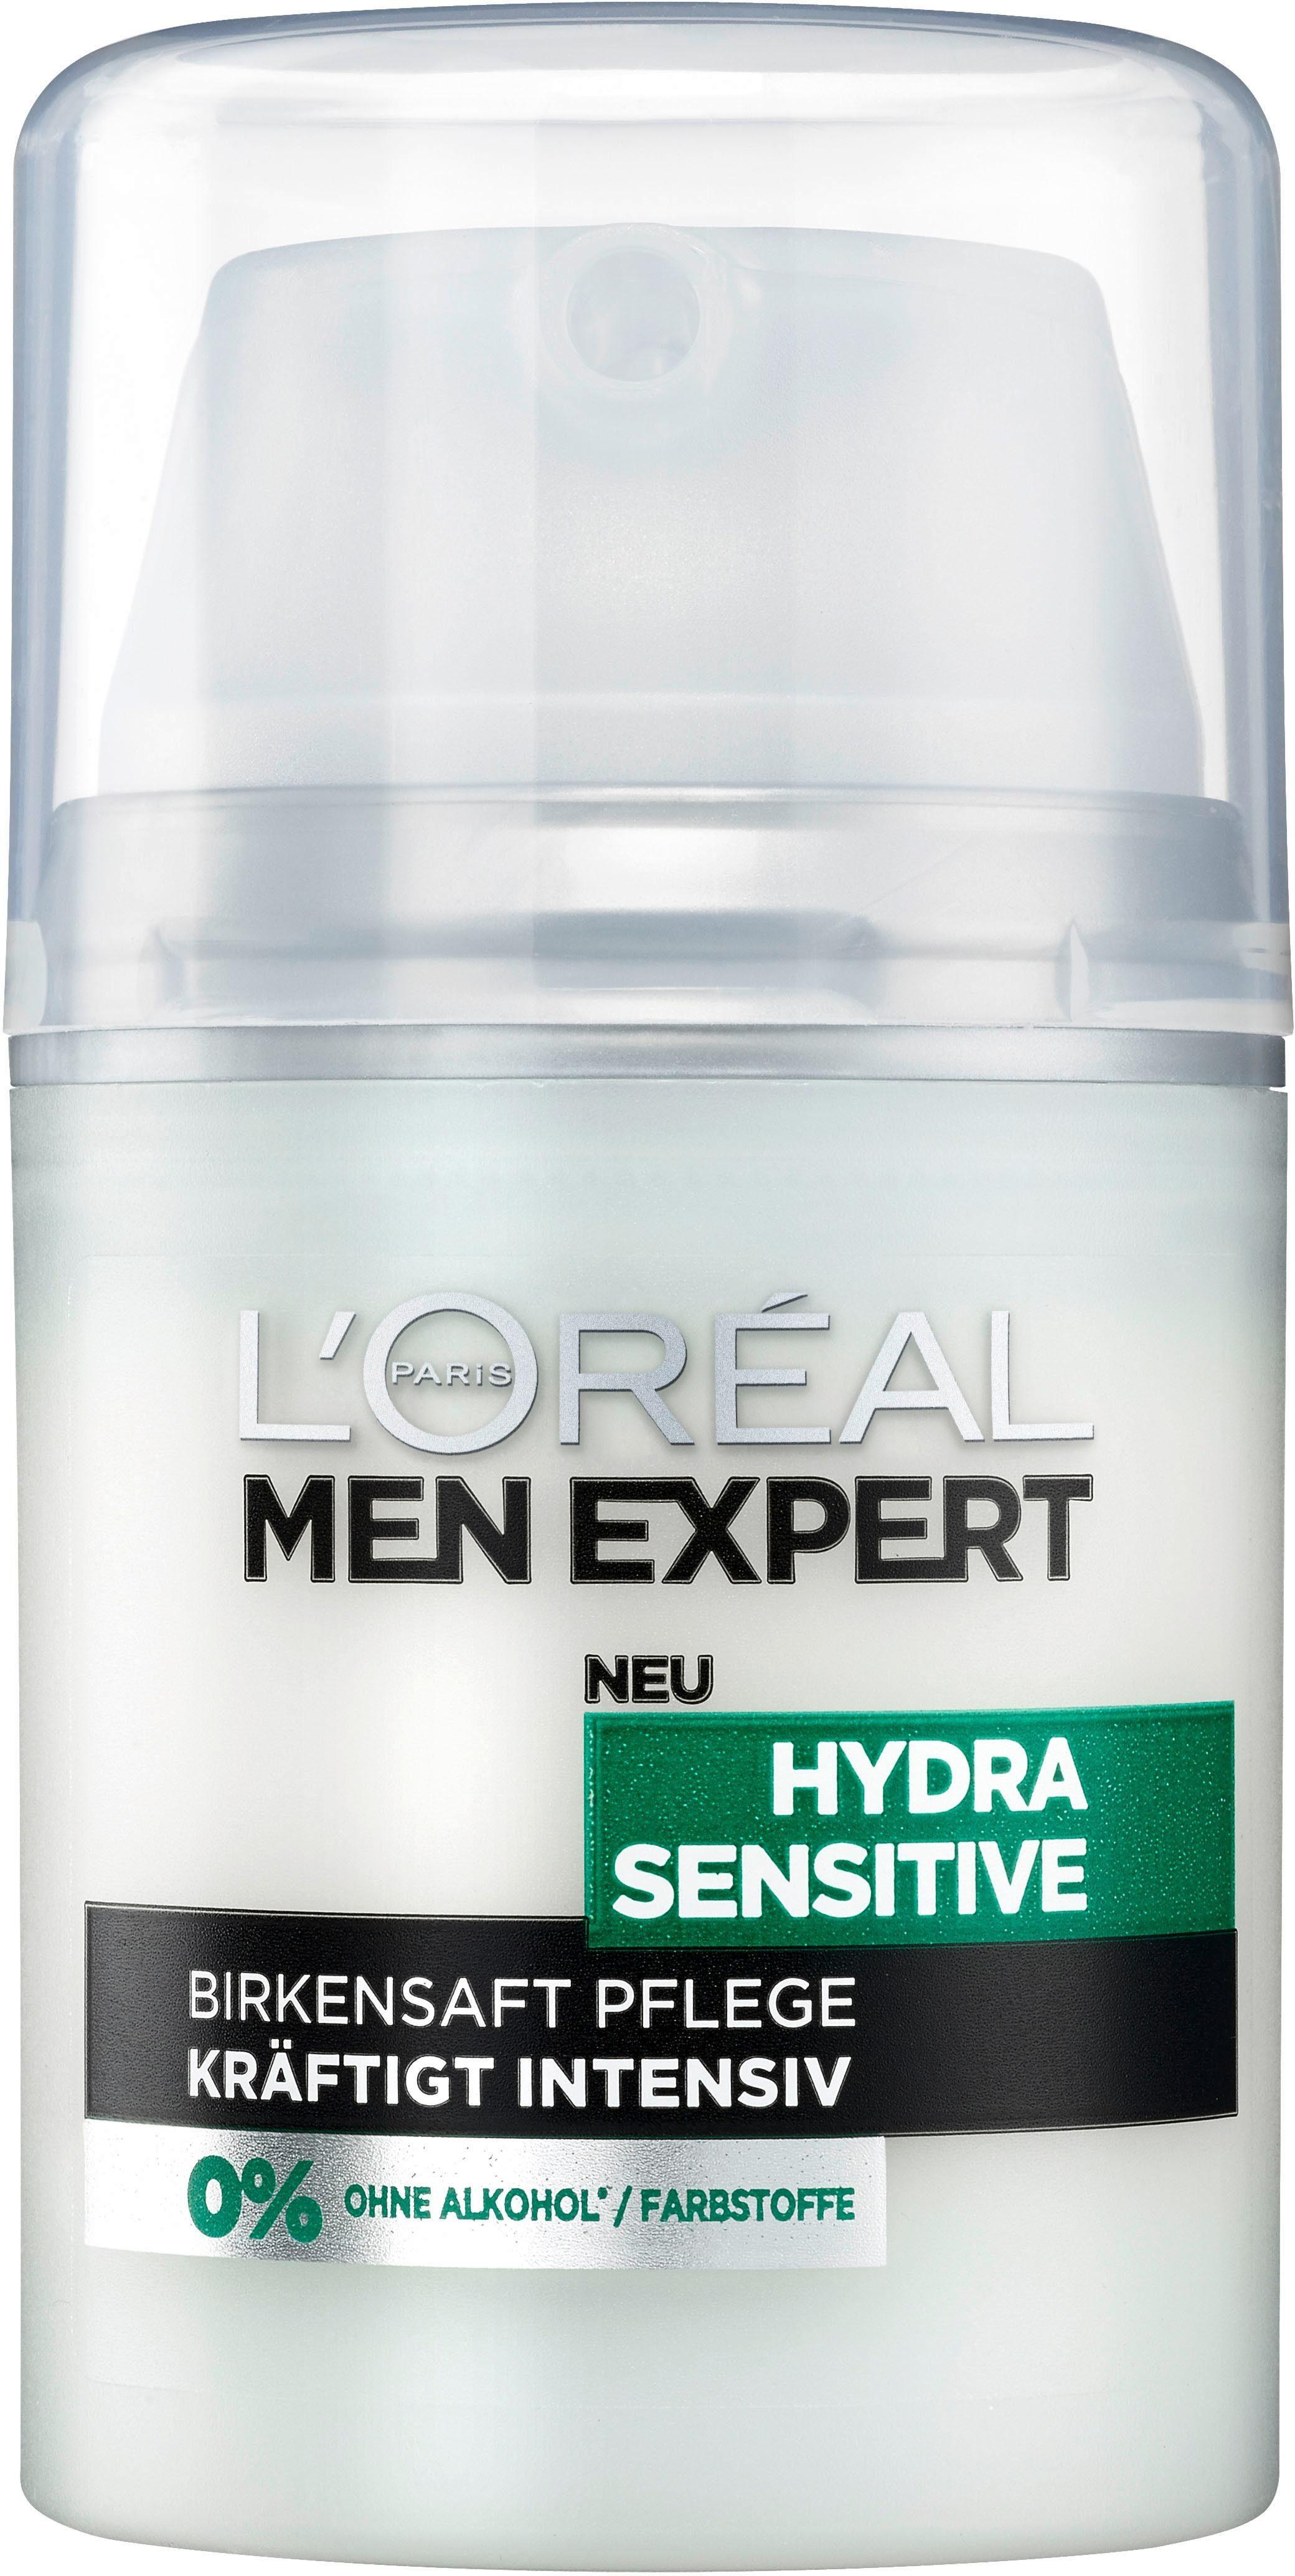 L'Oréal Paris Men Expert, »Hydra Sensitive Birkensaft Feuchtigkeitspflege«, Männerpflege